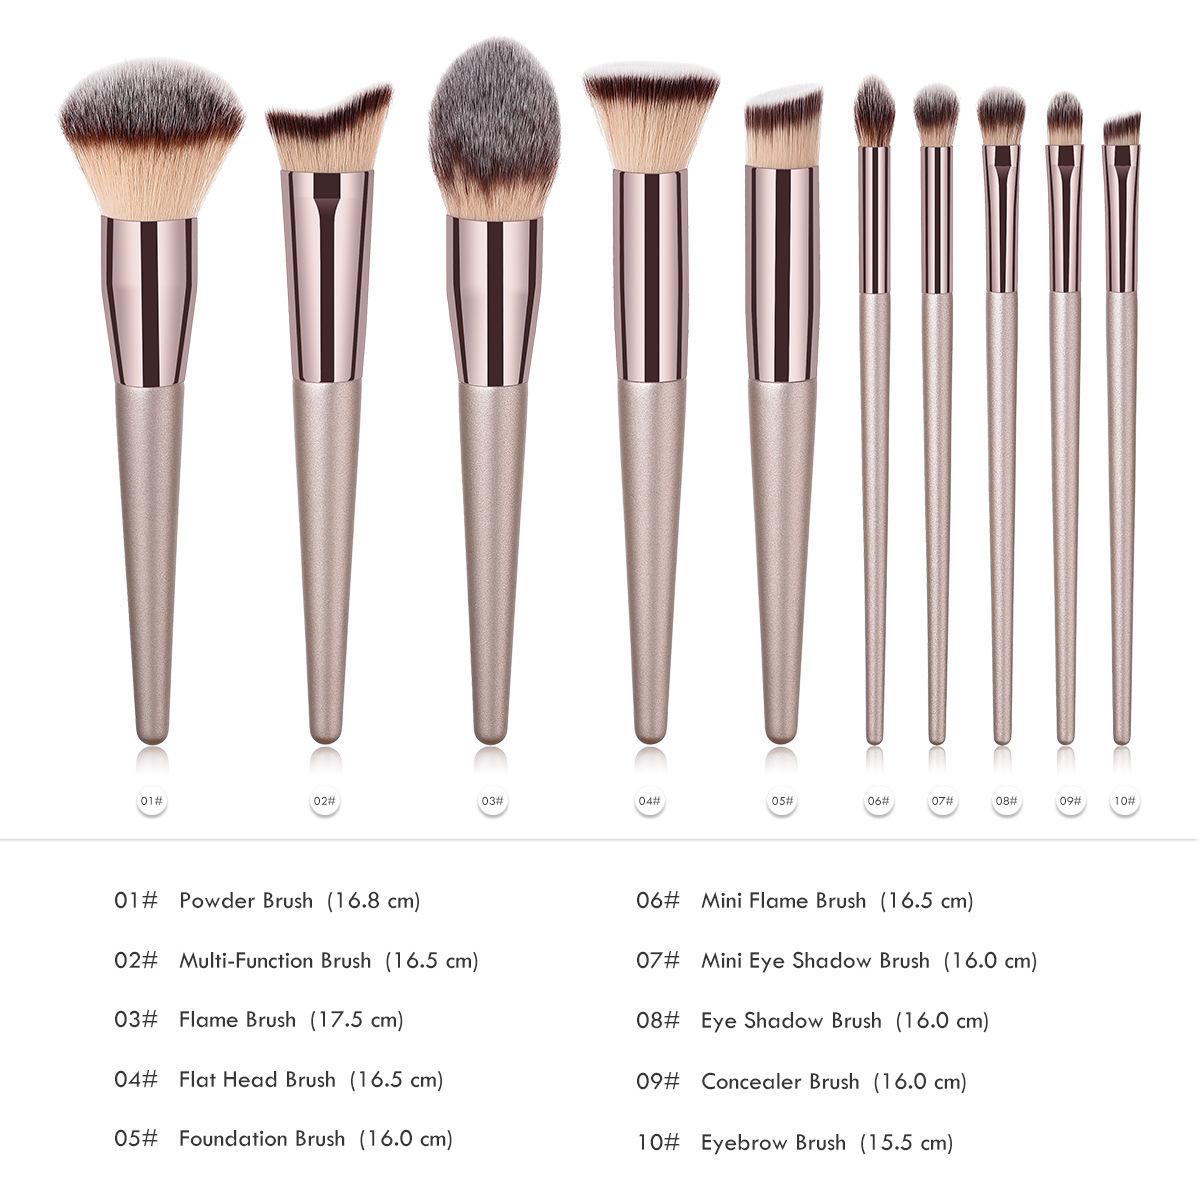 Makeup Powder / Foundation Eyeshadow Contour / Tapered Highlighter Eye Blending Brush Cosmetics Tools